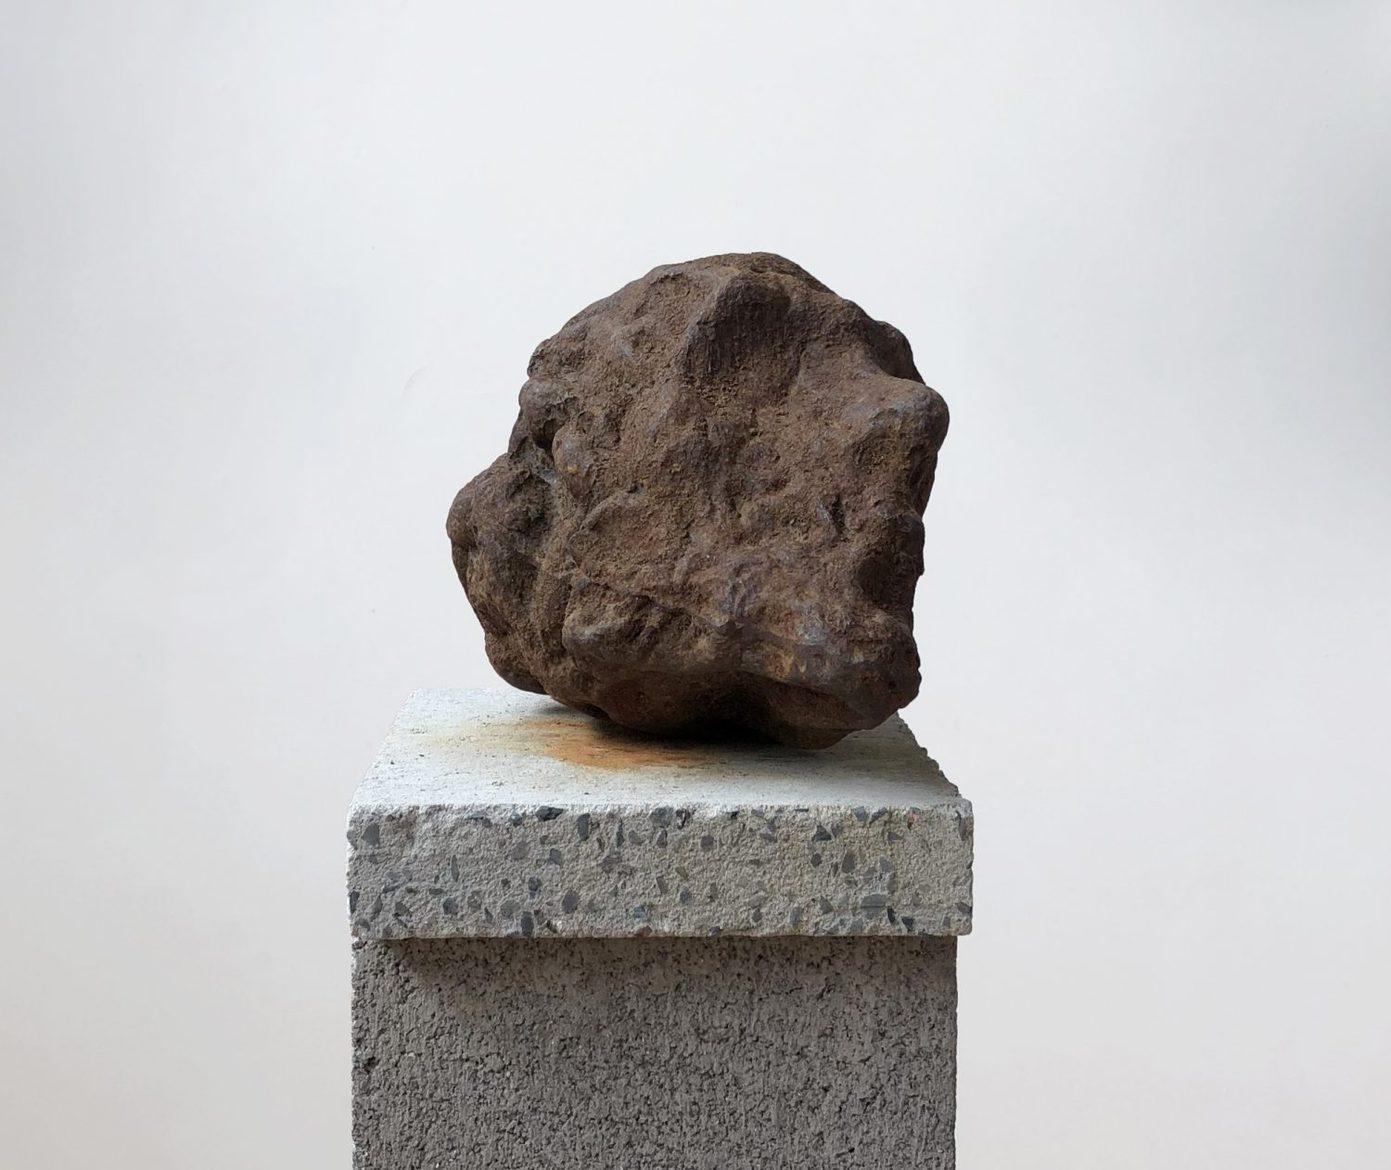 Gary Deirmendjian, 'the seasons iii', 2005, cast iron, 30 x 43 x 33 cm, unique